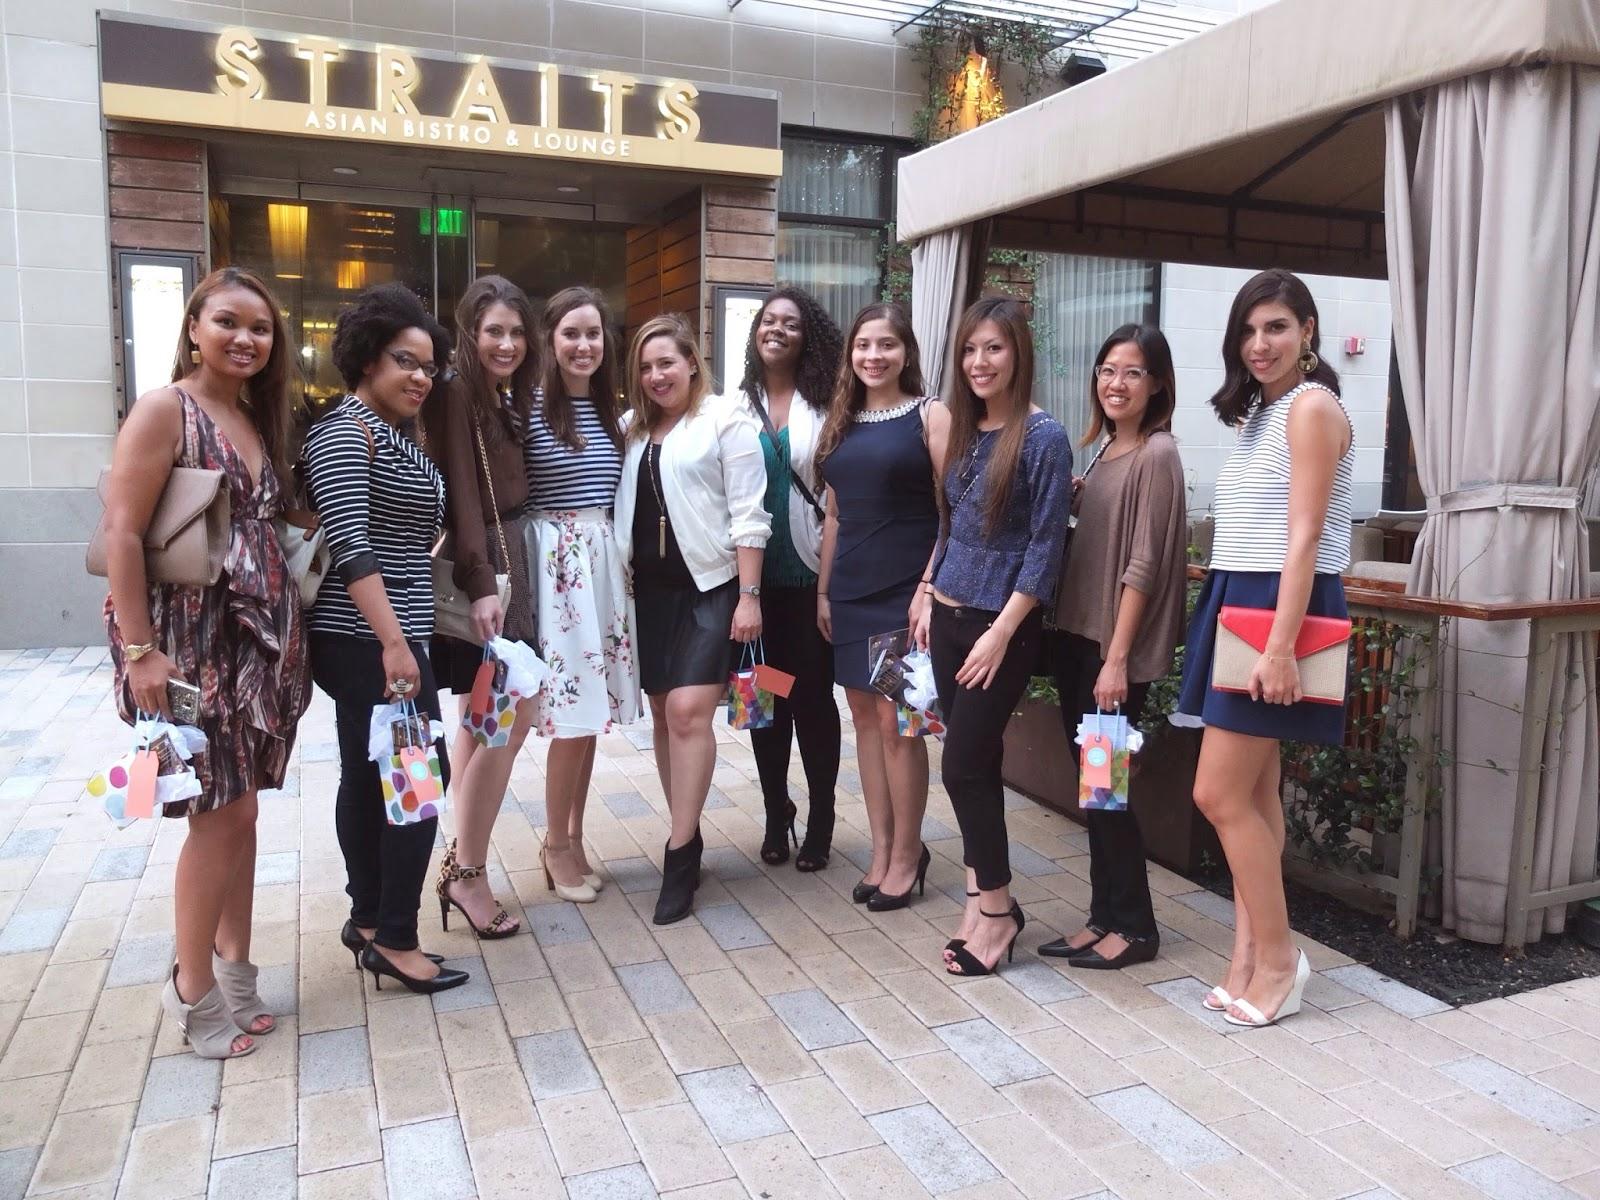 houston fashion bloggers, houston bloggers, citycentre houston, trendy in texas